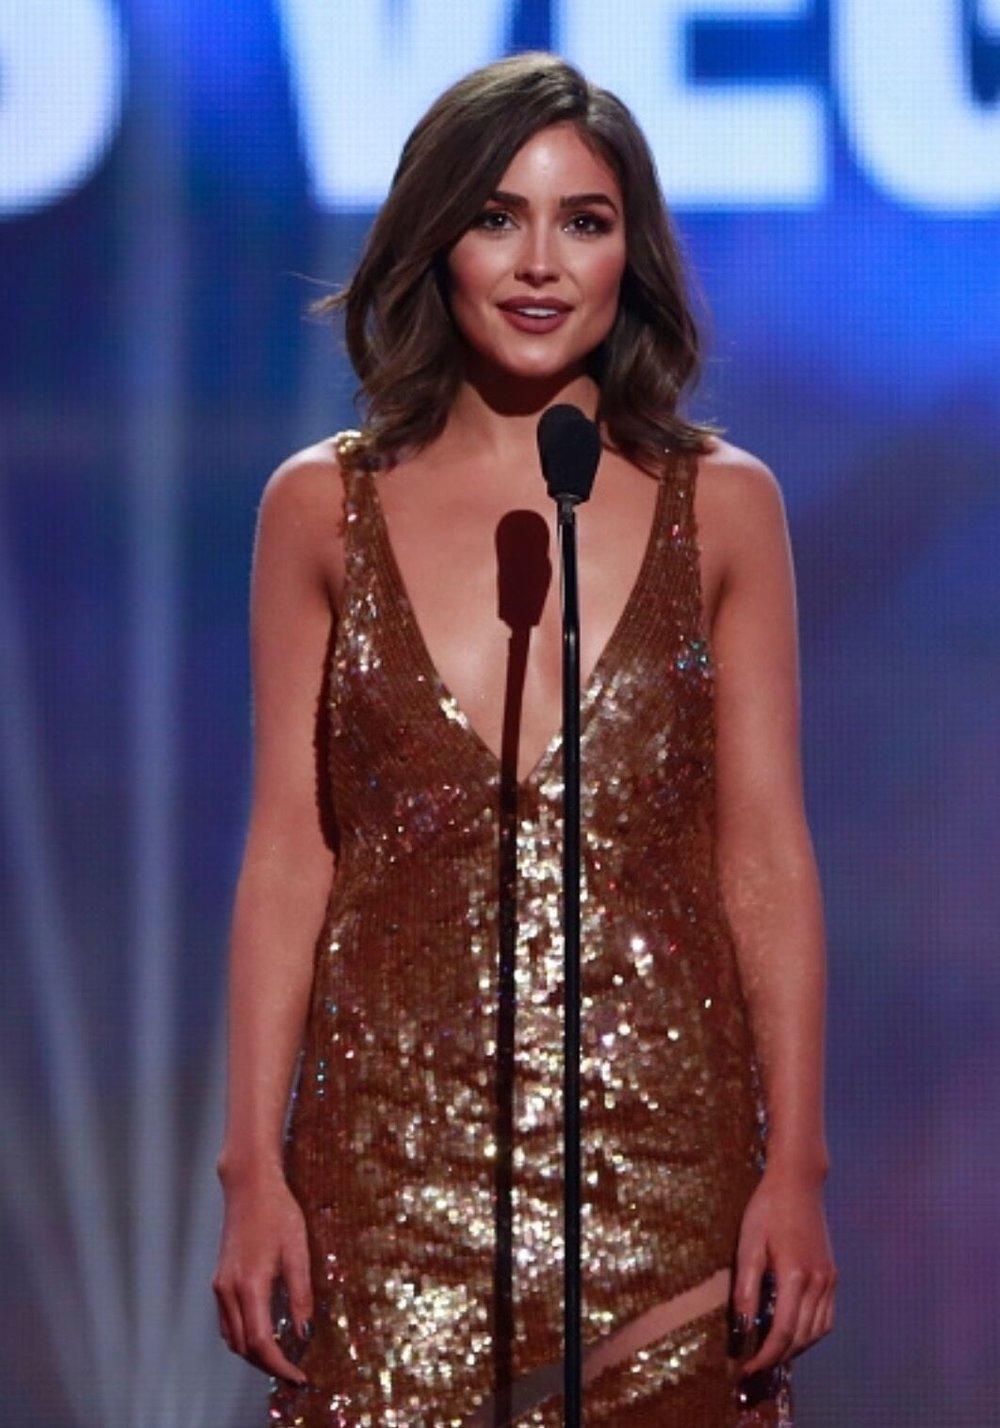 Olivia Culpo GQ Awards